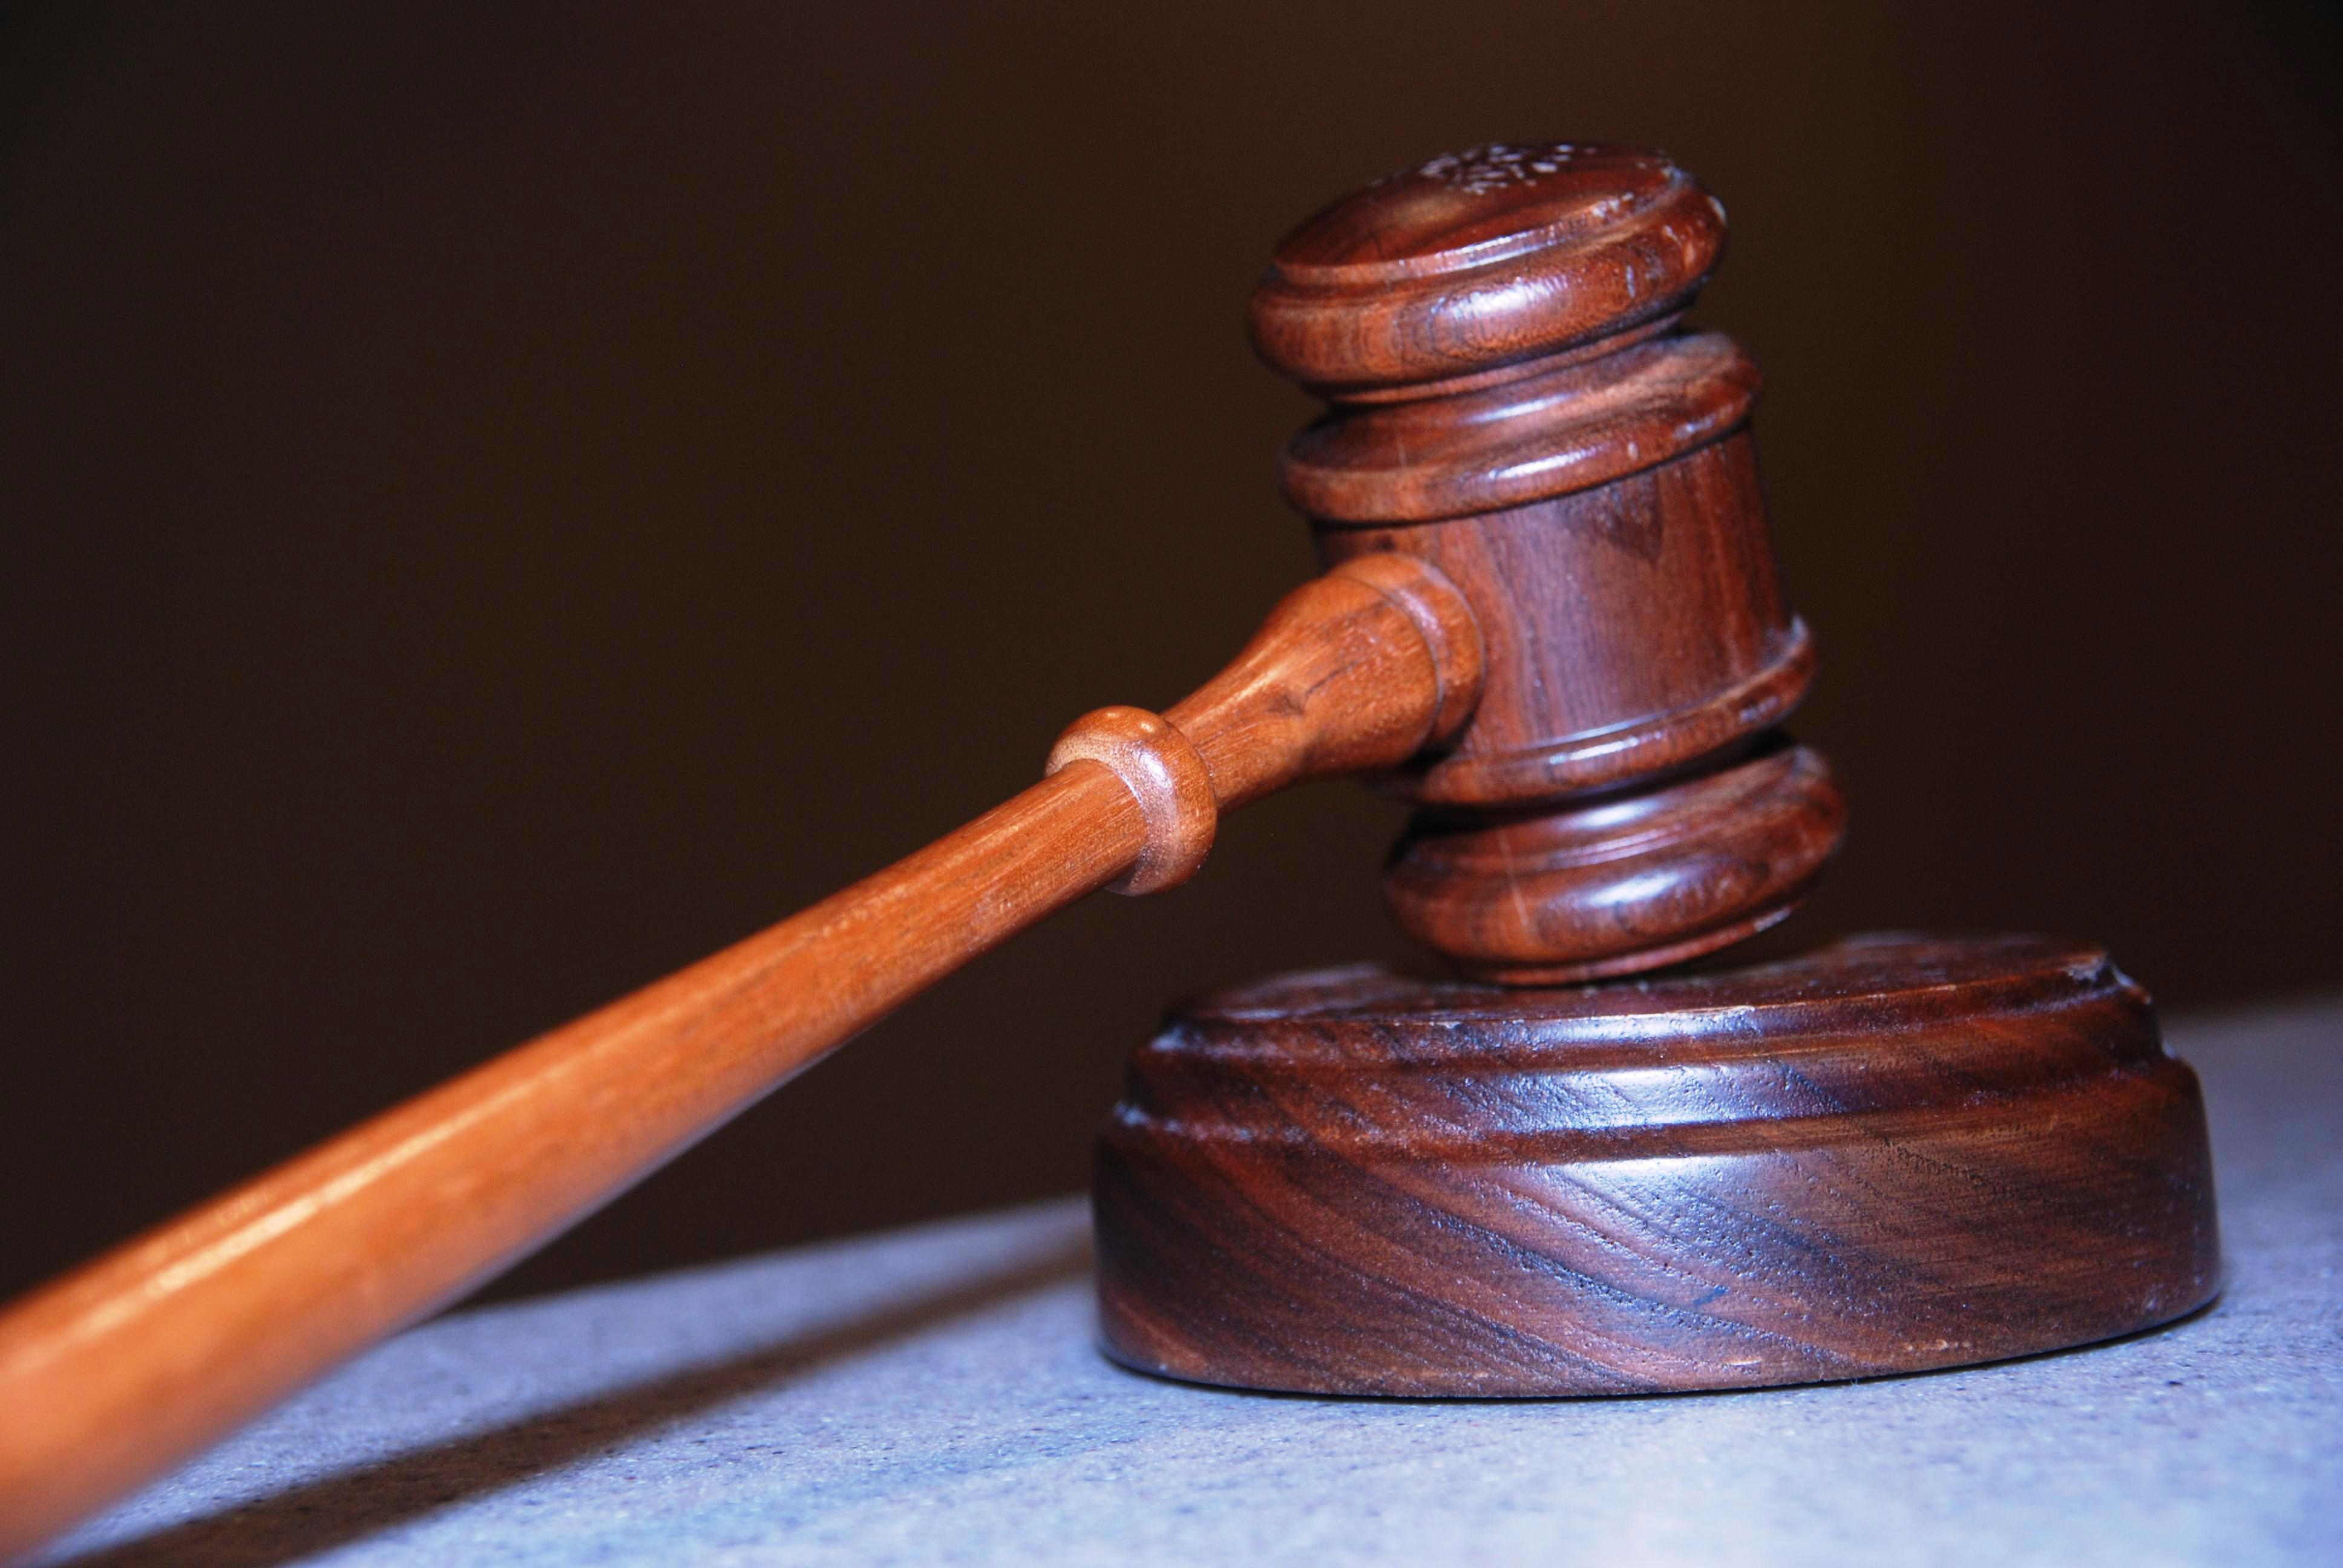 cj reprimands fia dg over contempt of court